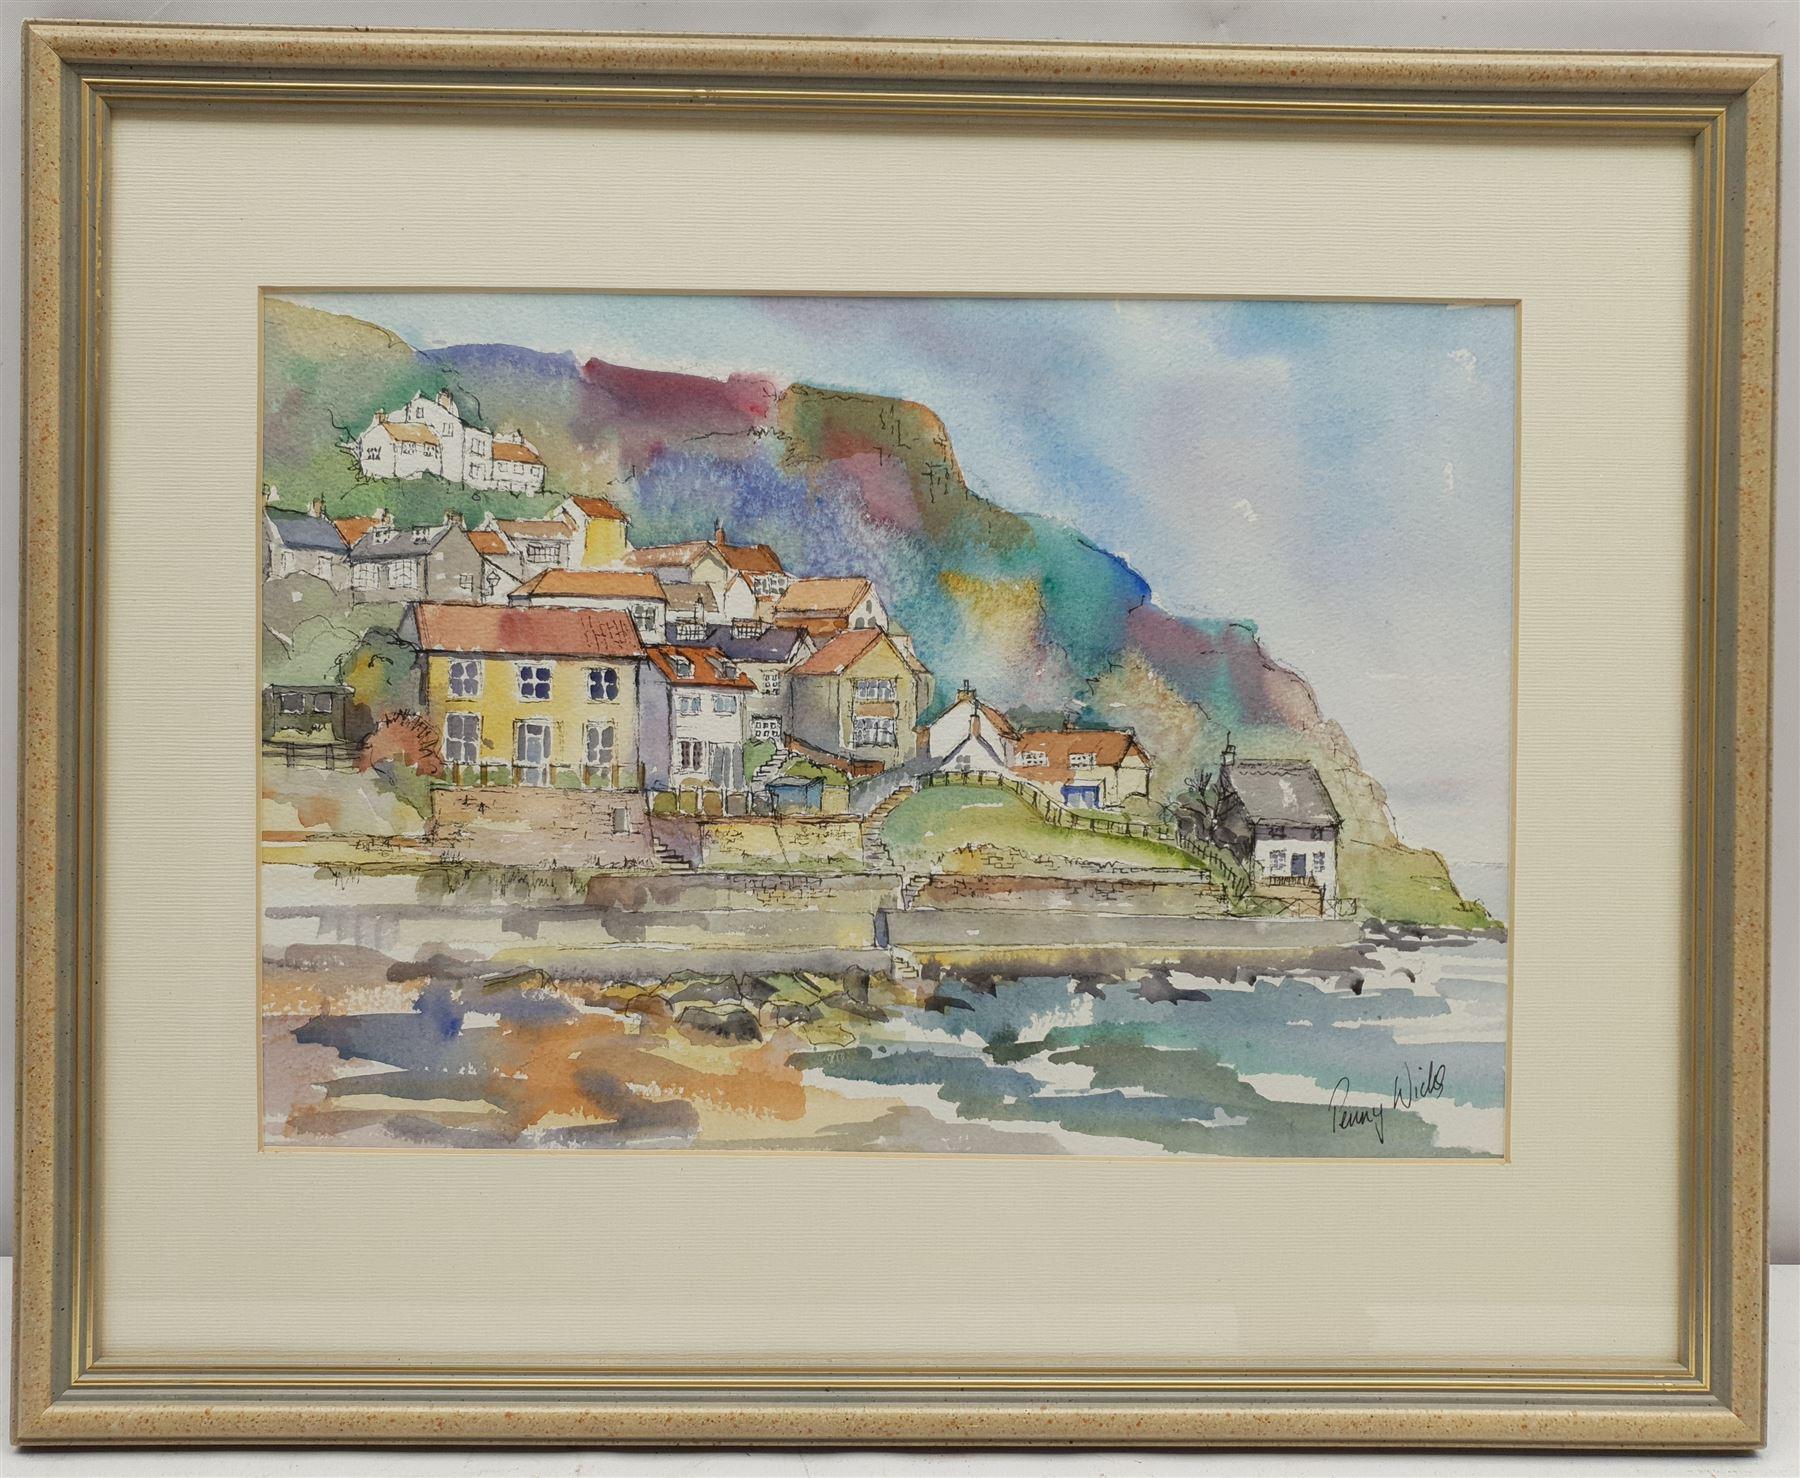 Penny Wicks (British 1949-): 'Runswick Bay' - Image 2 of 2